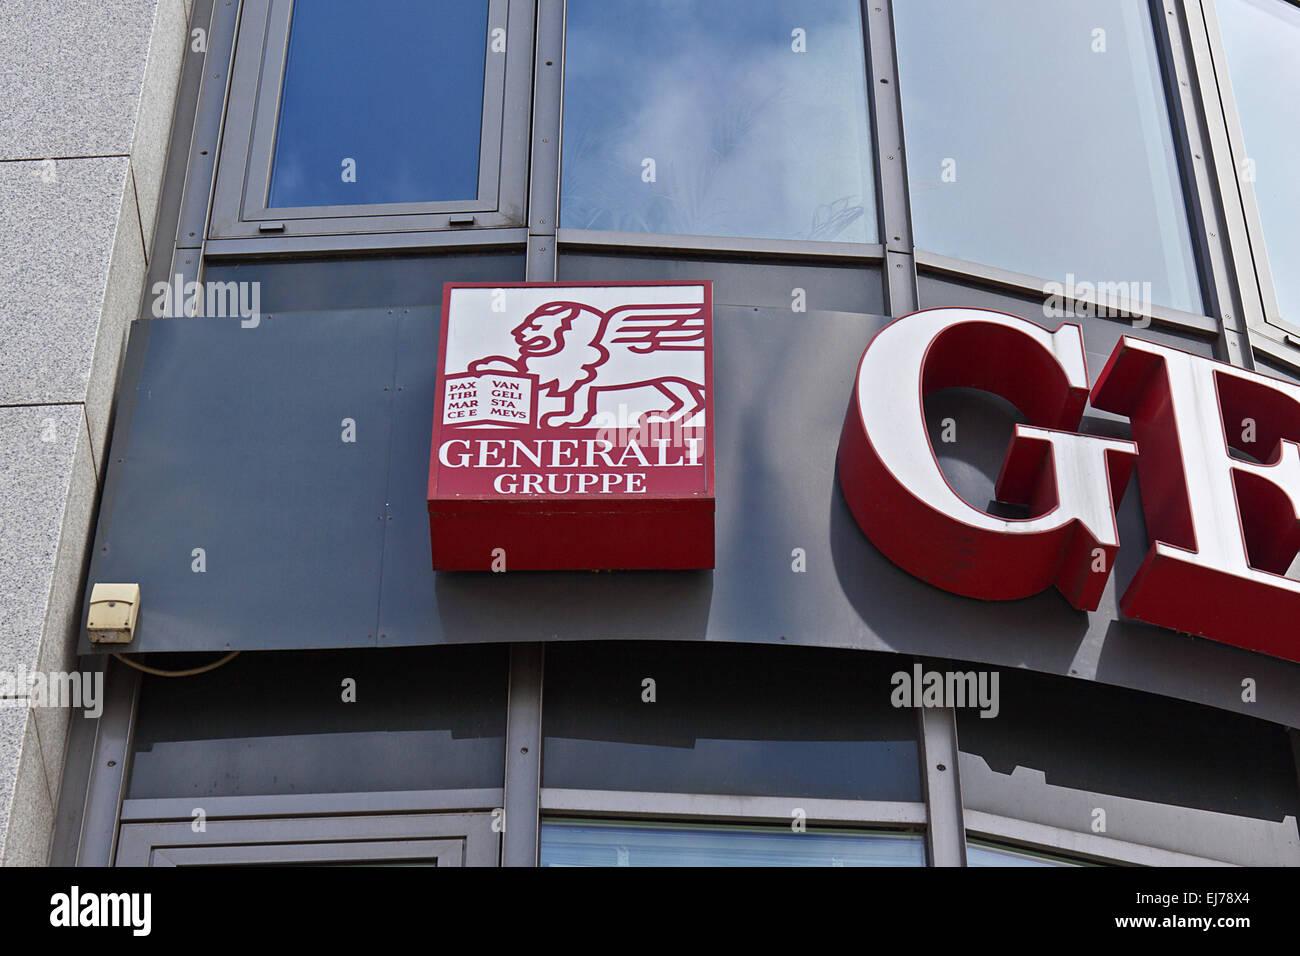 Generali Group - Stock Image